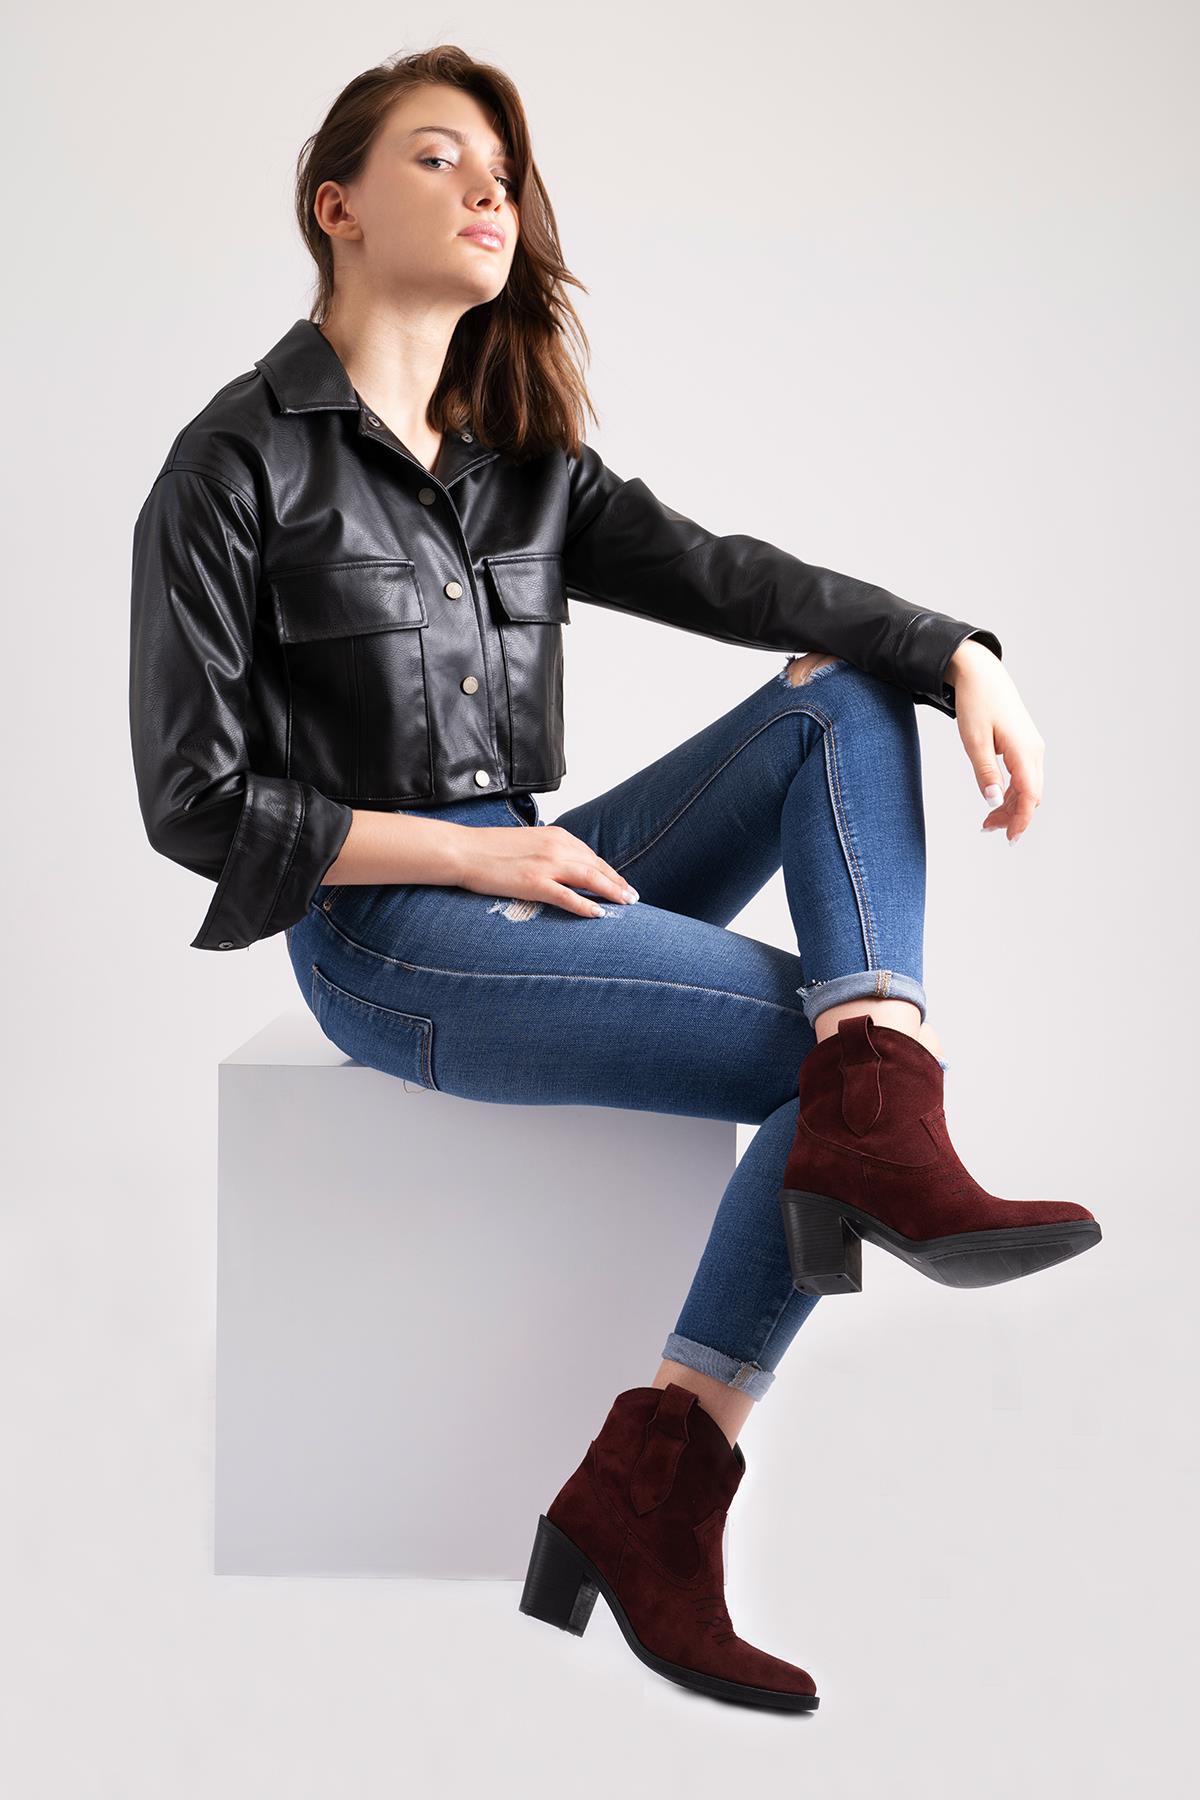 Callizio feminino couro genuíno bloco saltos botas de cowboy novo 2021 ocidental salto alto boot ankle booties feminino casual alta qualidade